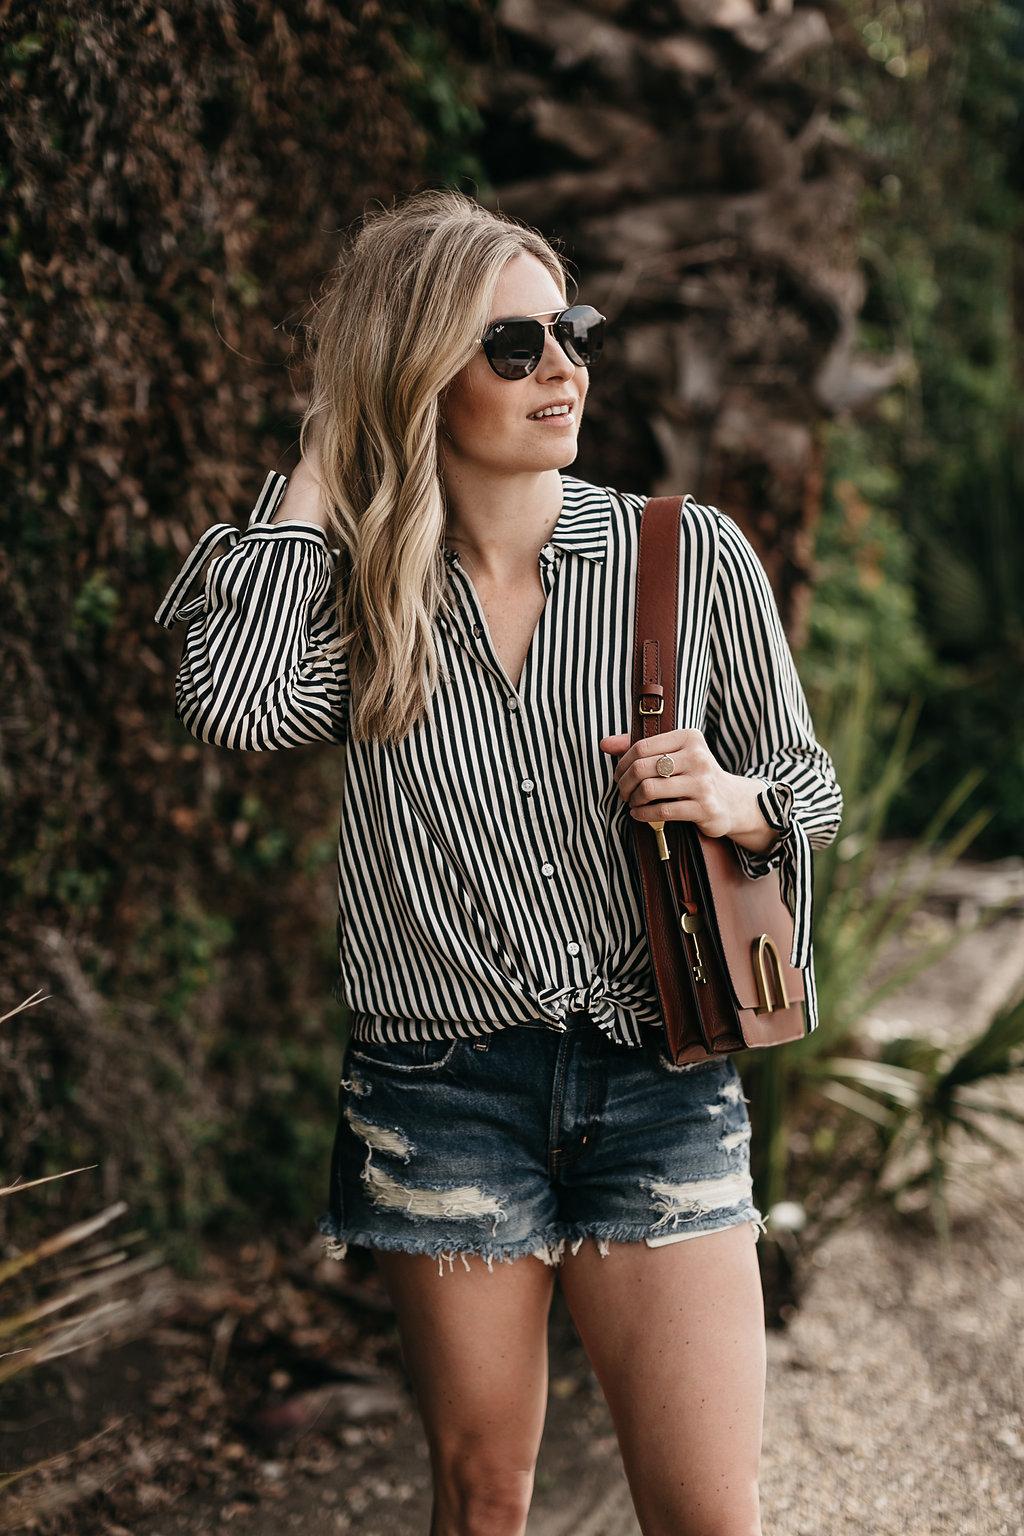 Striped spring top and distressed denim cutoffs